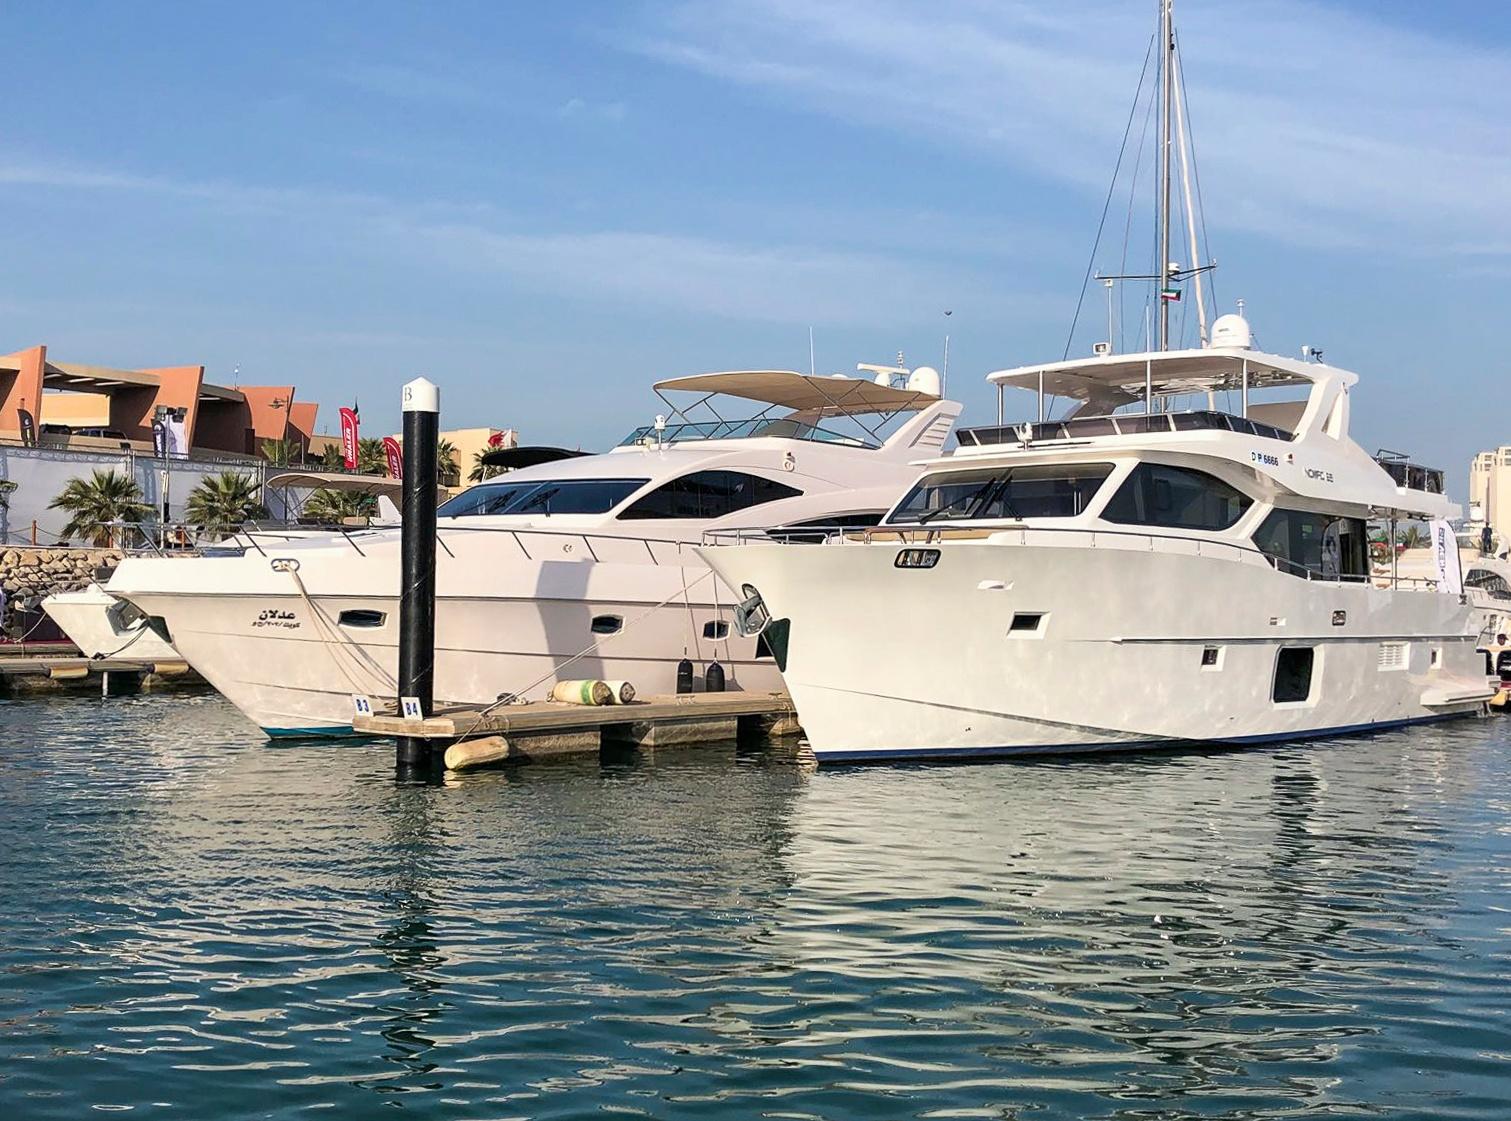 Gulf Craft at Kuwait Yacht Show 2018 (8).jpg